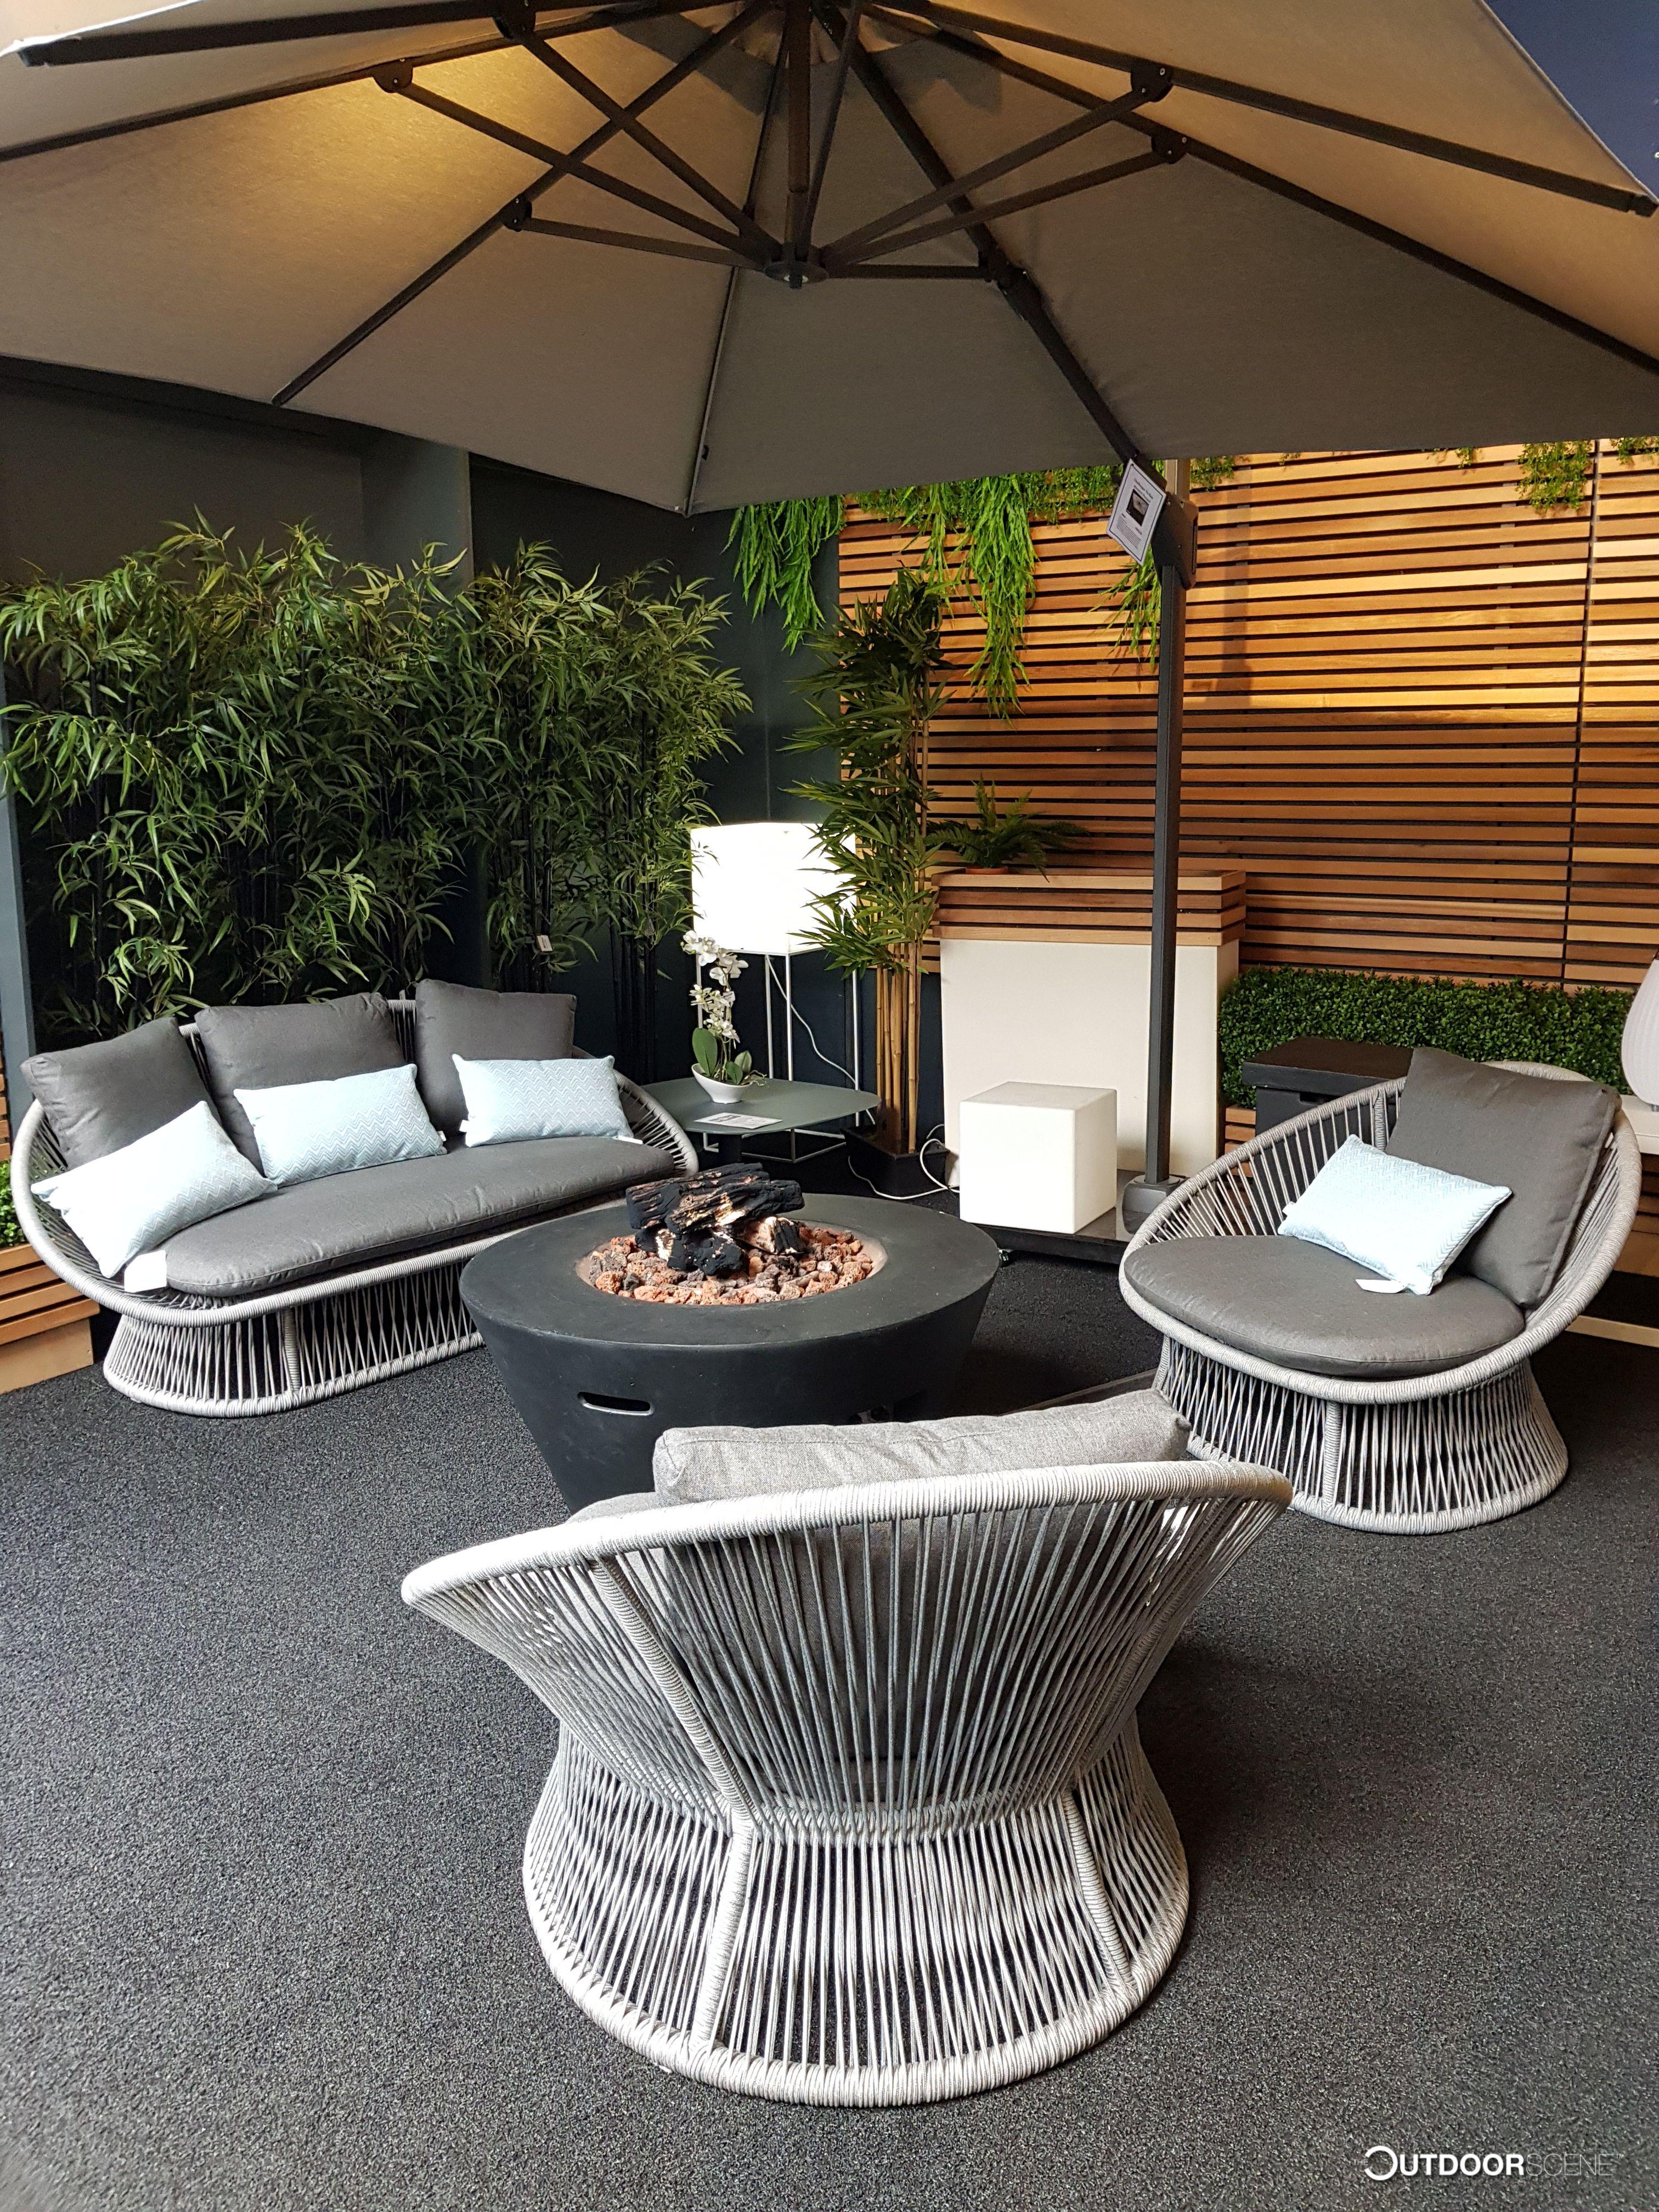 Stunning Garden Furniture Set Modern Outdoor Furniture Garden Furniture Garden Furniture Sets [ 4032 x 3024 Pixel ]